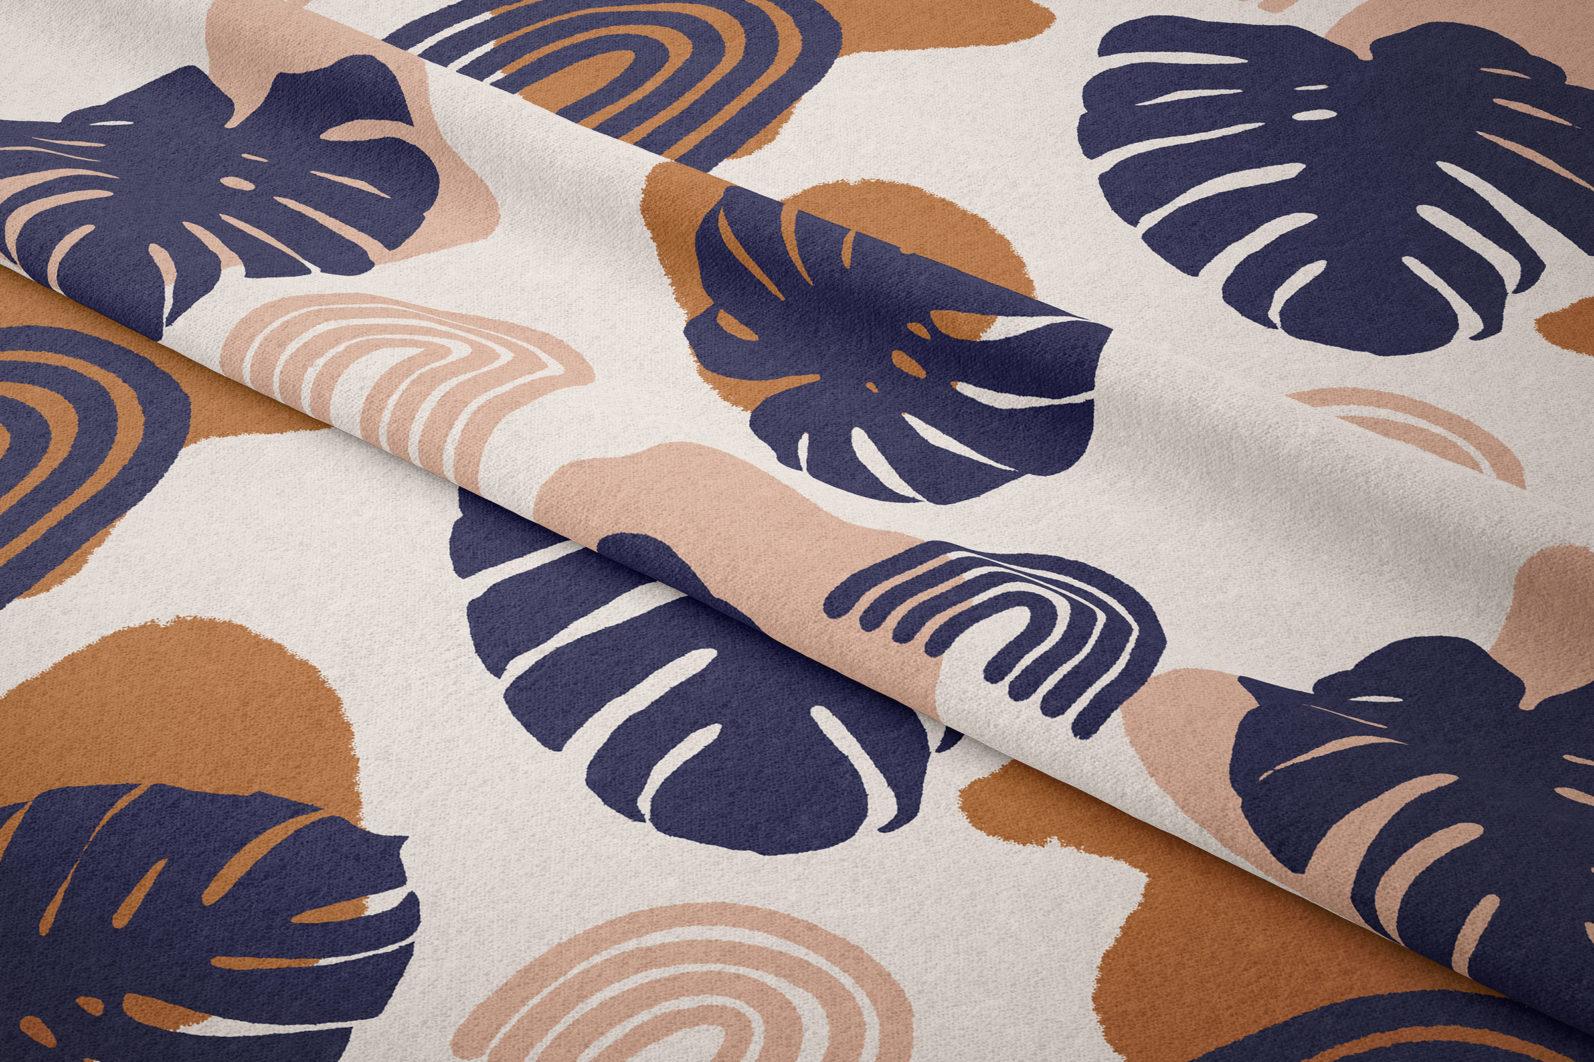 Palm leaves seamless pattern - 4 29 -